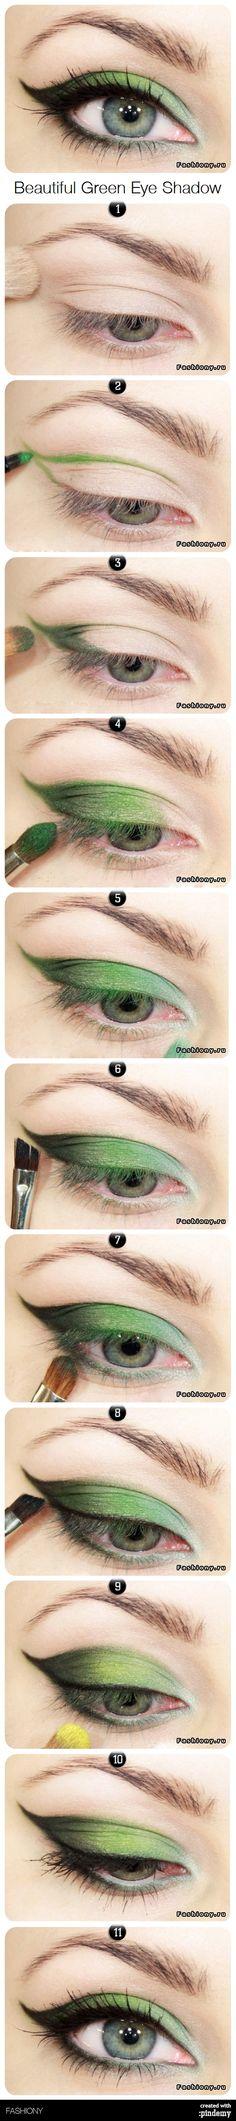 Pretty Green Wing, easily accomplished with ShadowSense @Gail Regan Truax://www.CelebrityLipstick.com